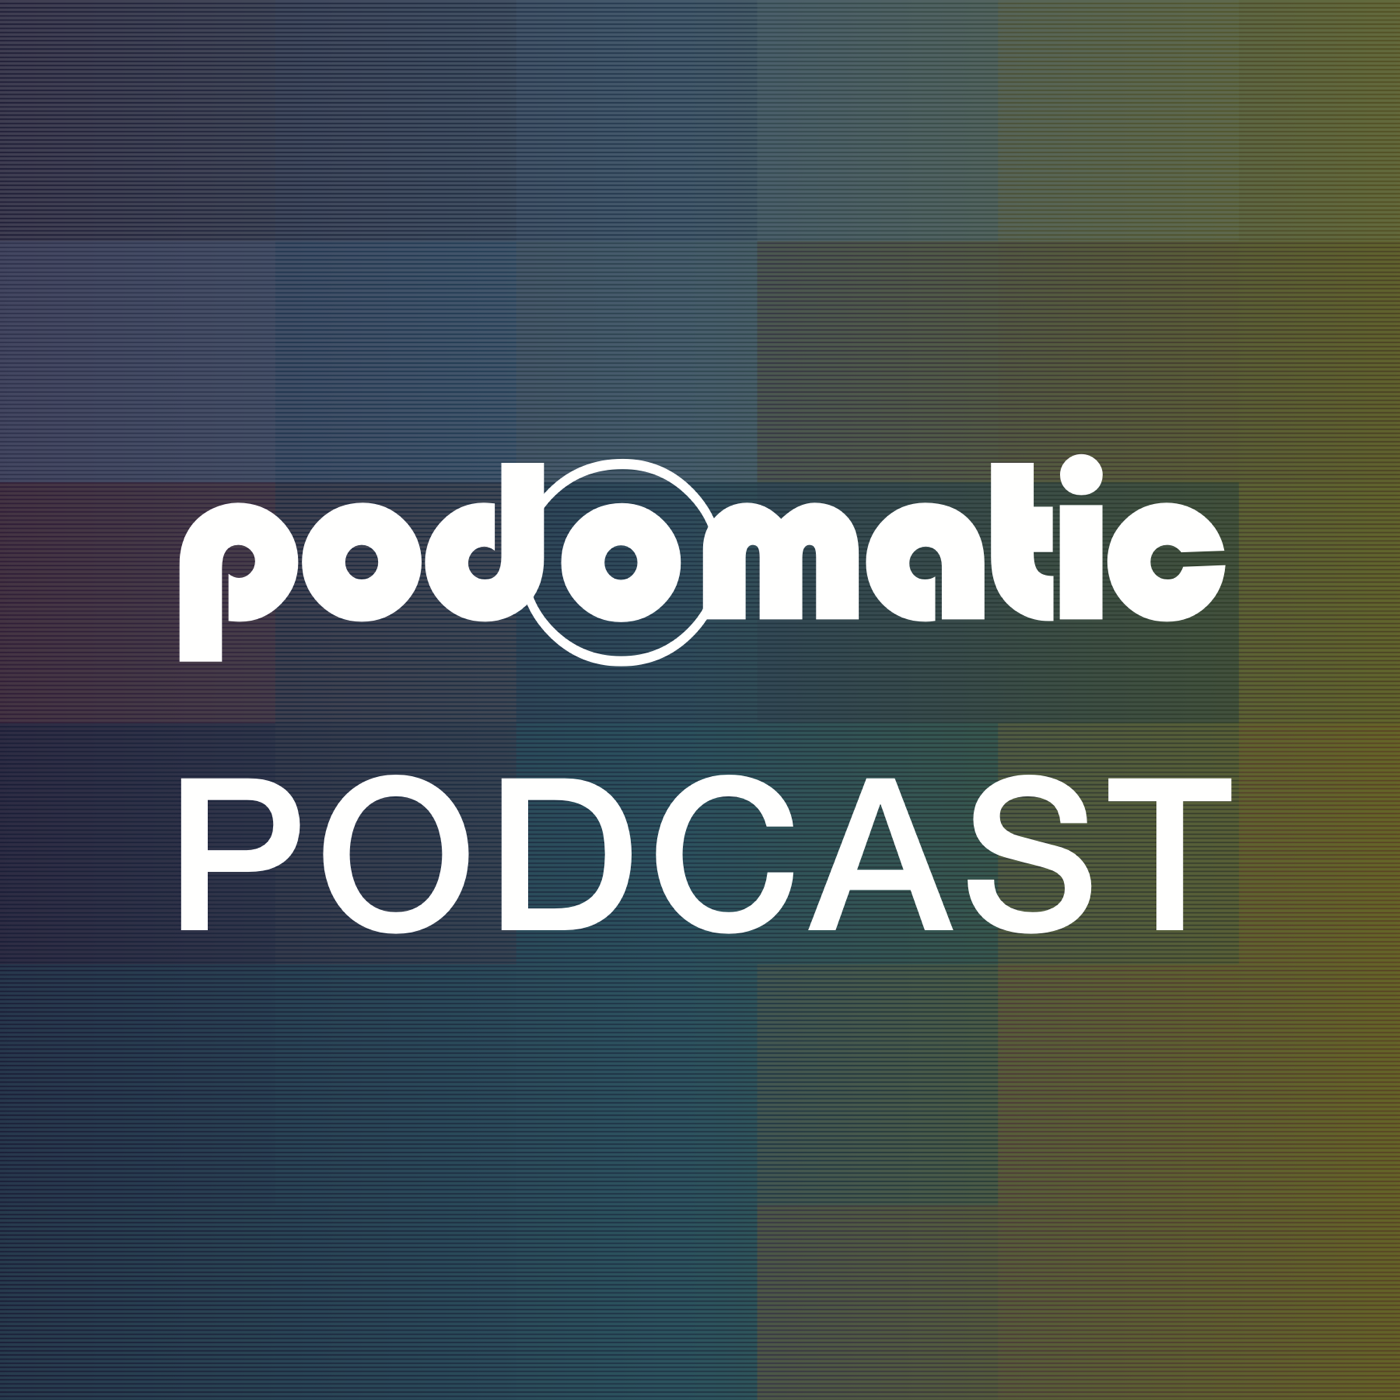 Fright night's Podcast